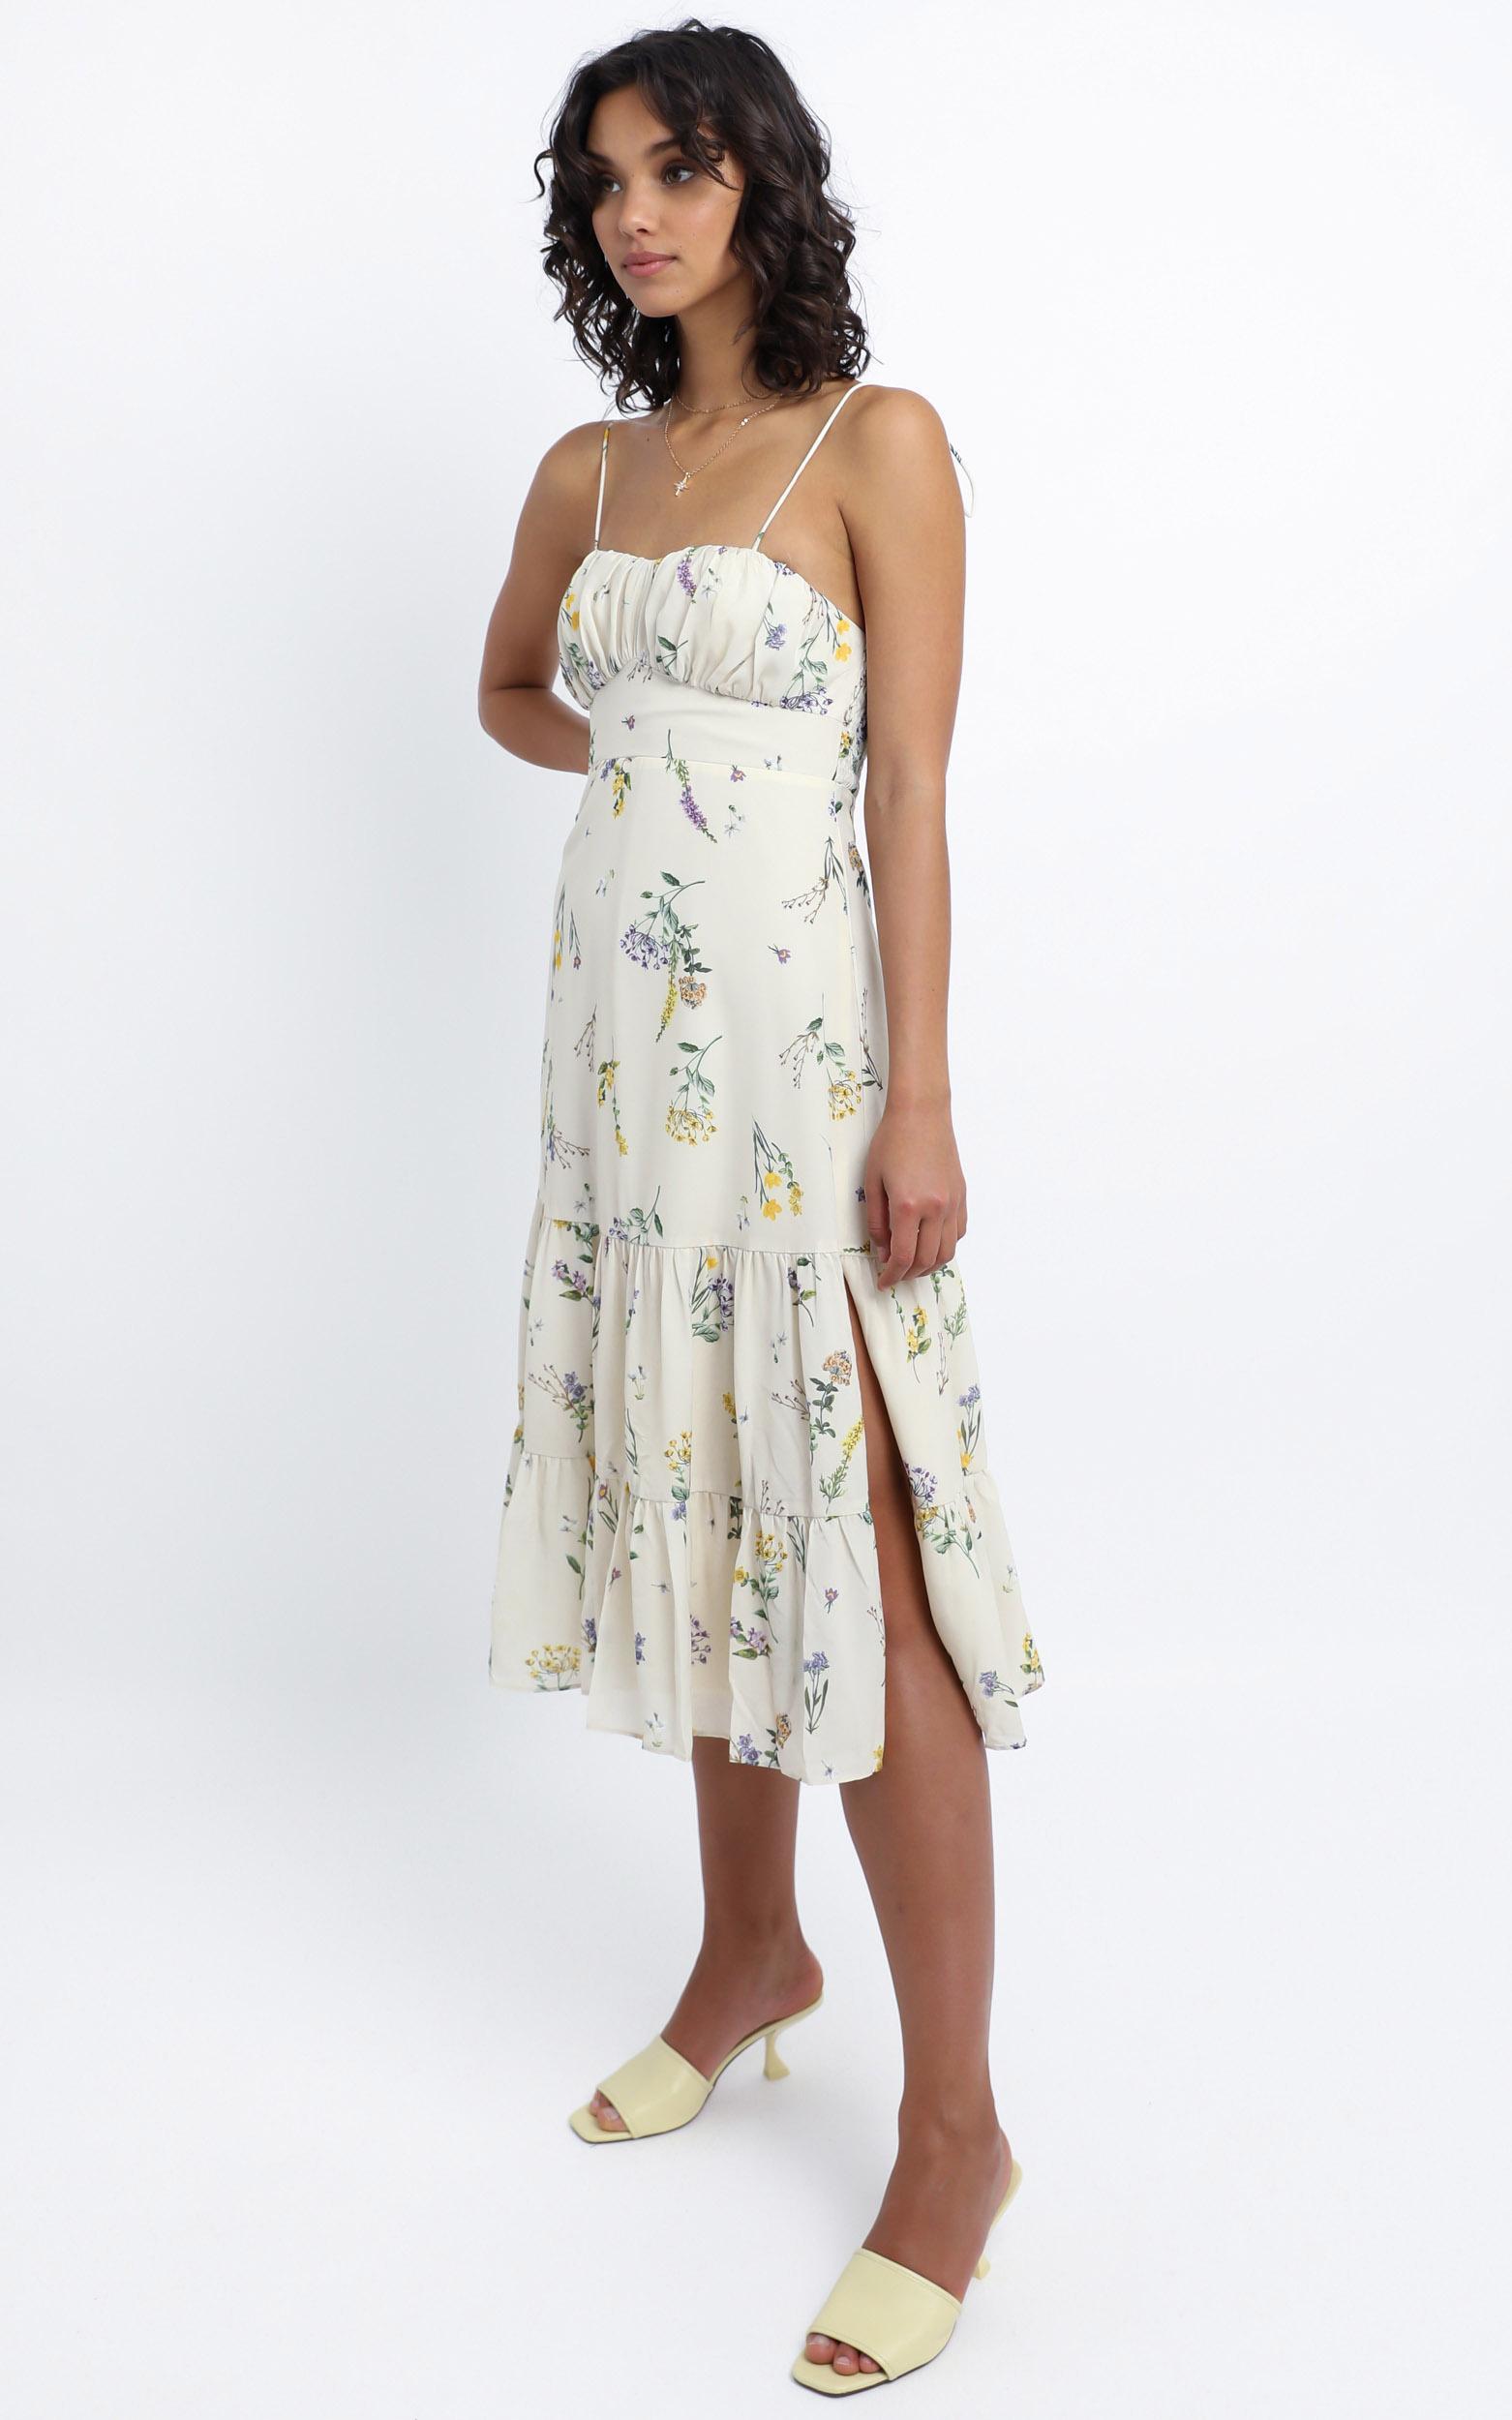 Monaco Dress in botanical floral - 4 (XXS), Cream, hi-res image number null